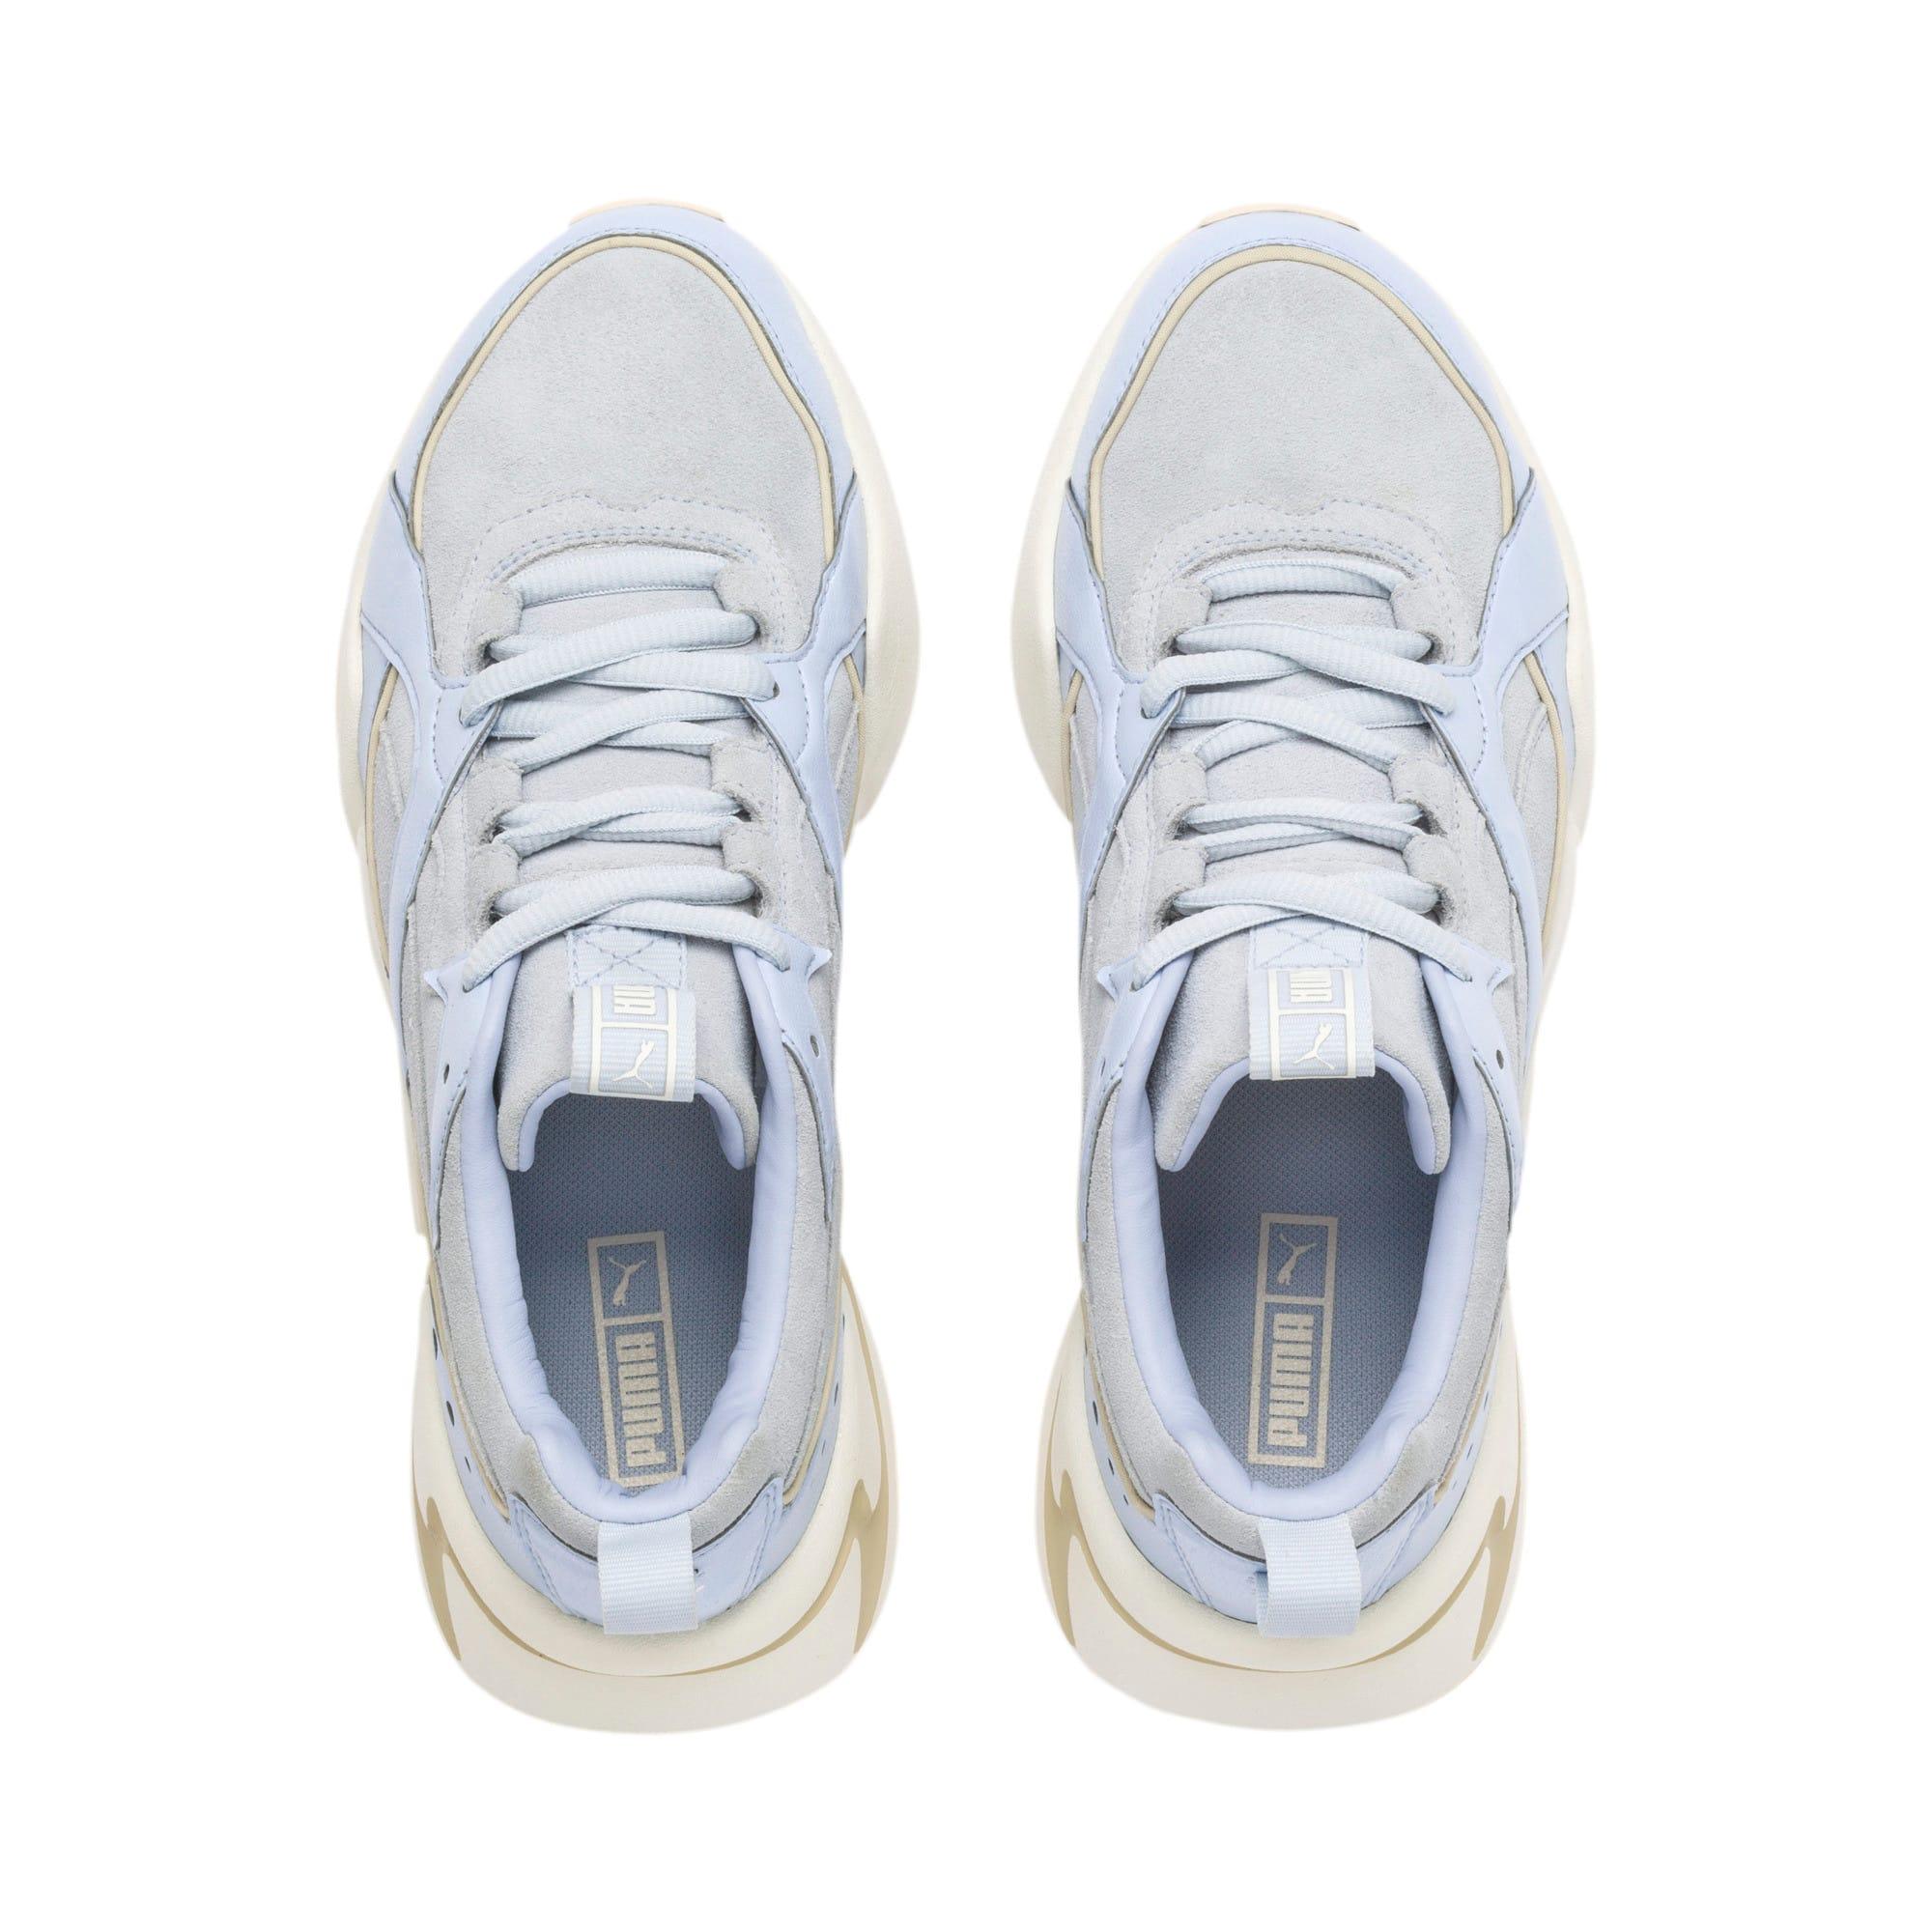 Thumbnail 7 of Nova 2 Suede Women's Sneakers, Heather-Whisper White, medium